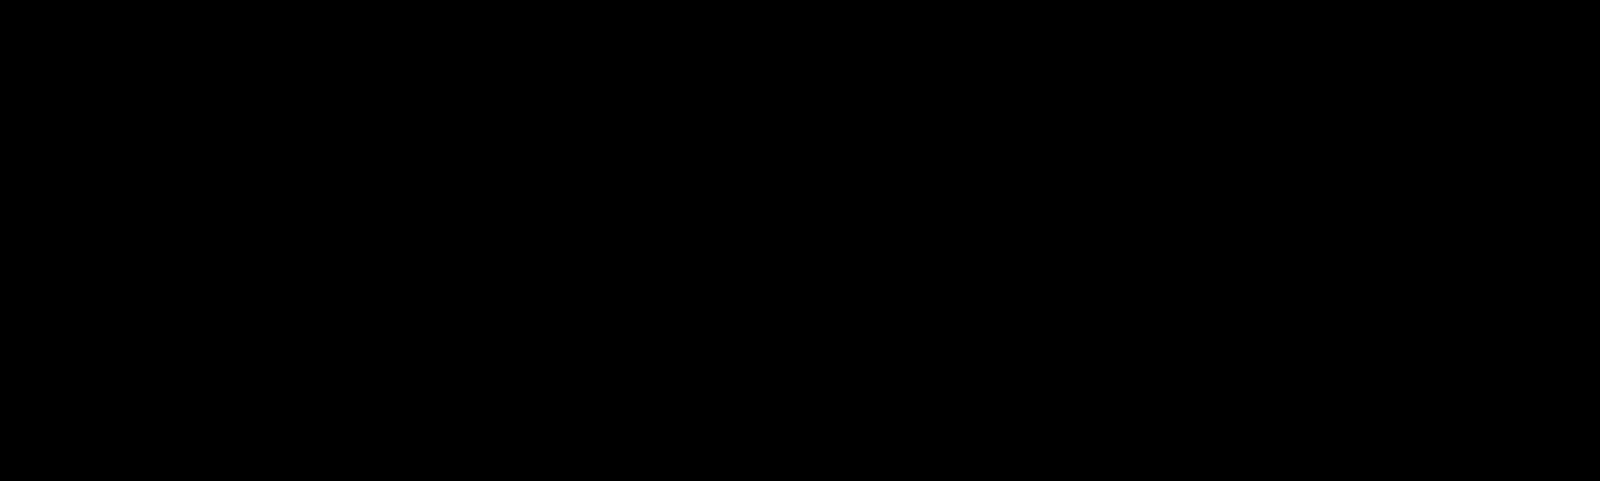 2000px_svg_3